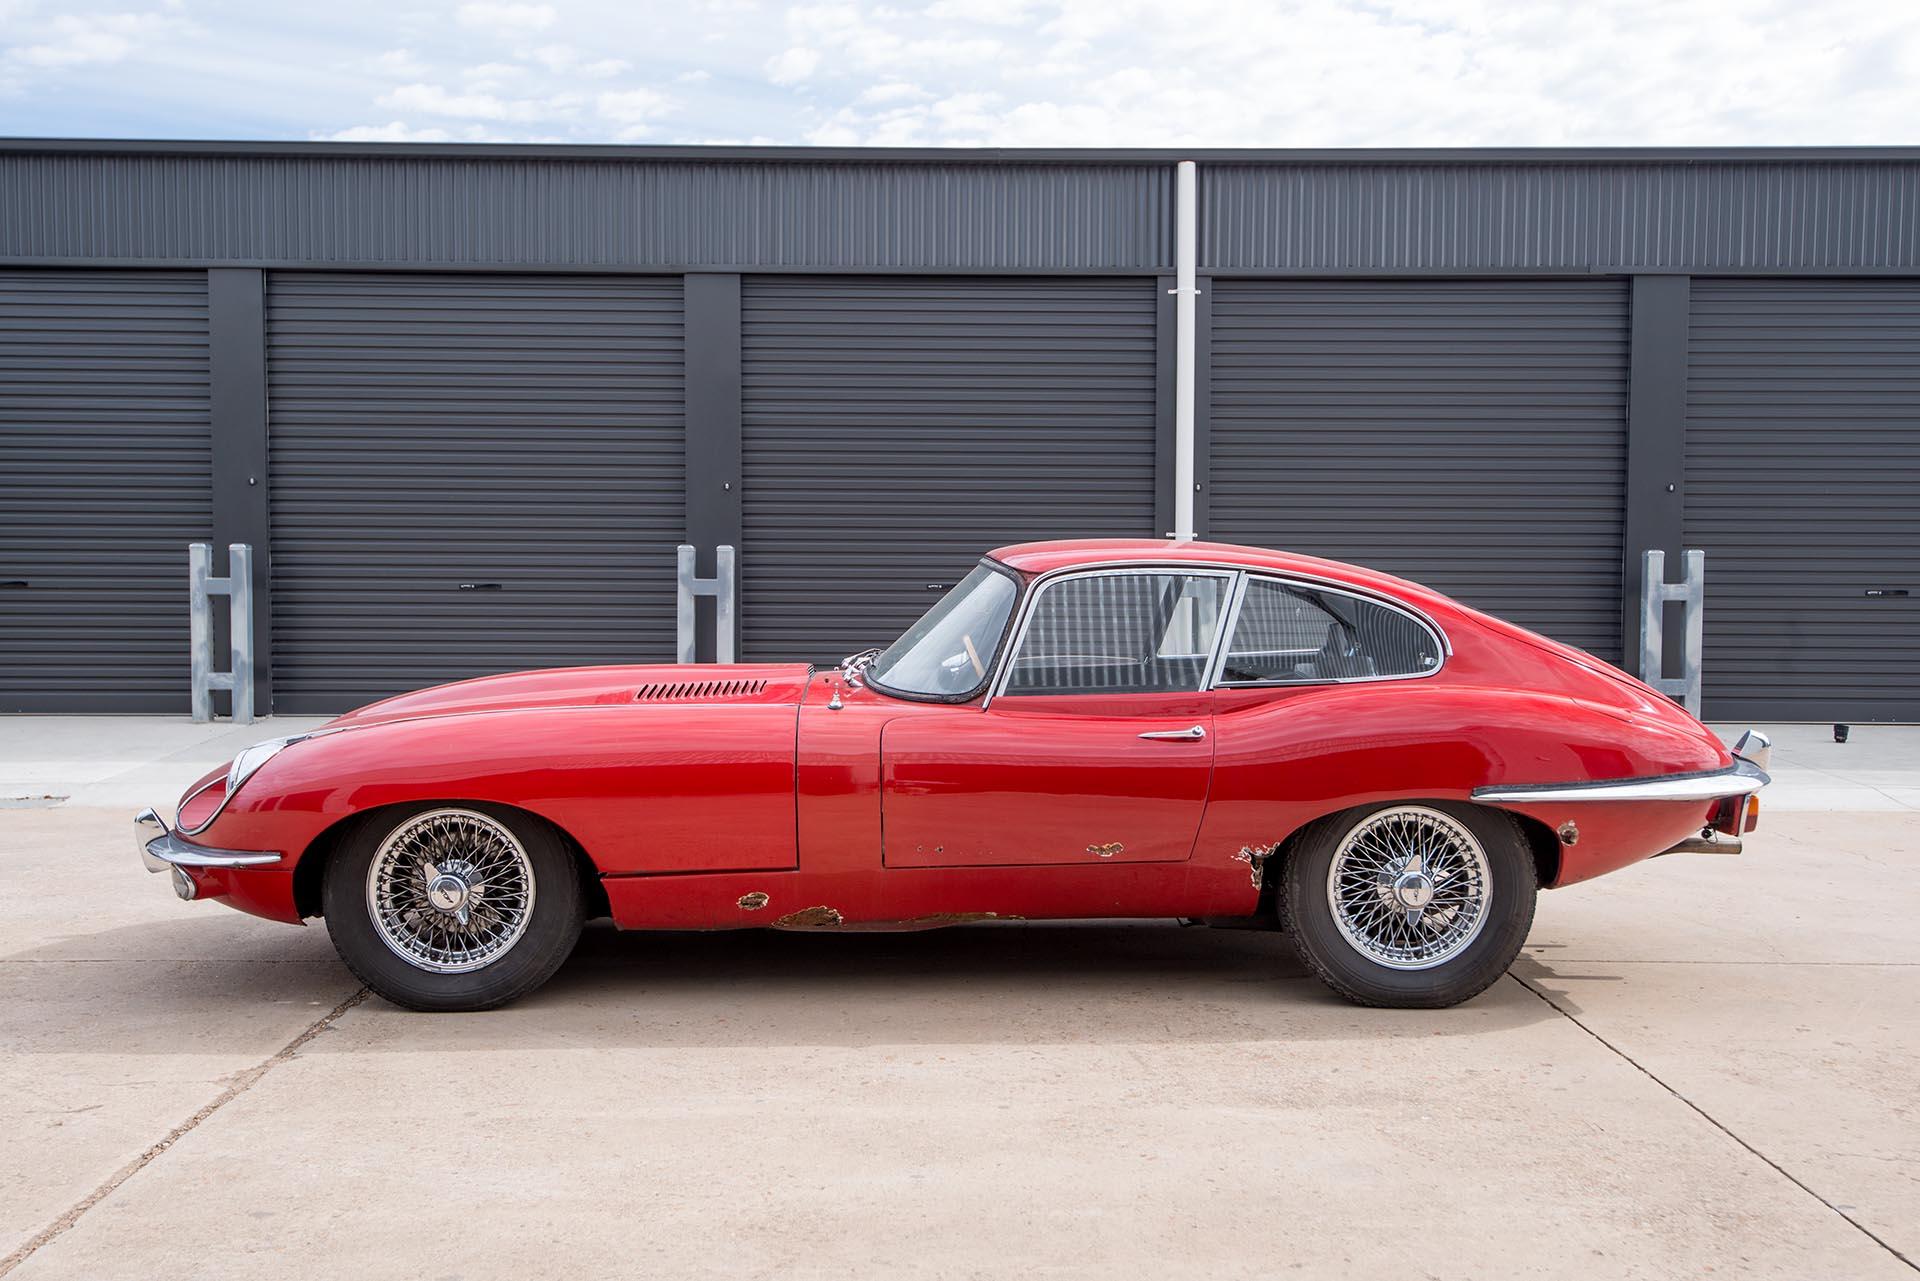 1969 Jaguar E-Type FHC - Richmonds - Classic and Prestige Cars - Storage and Sales - Adelaide ...